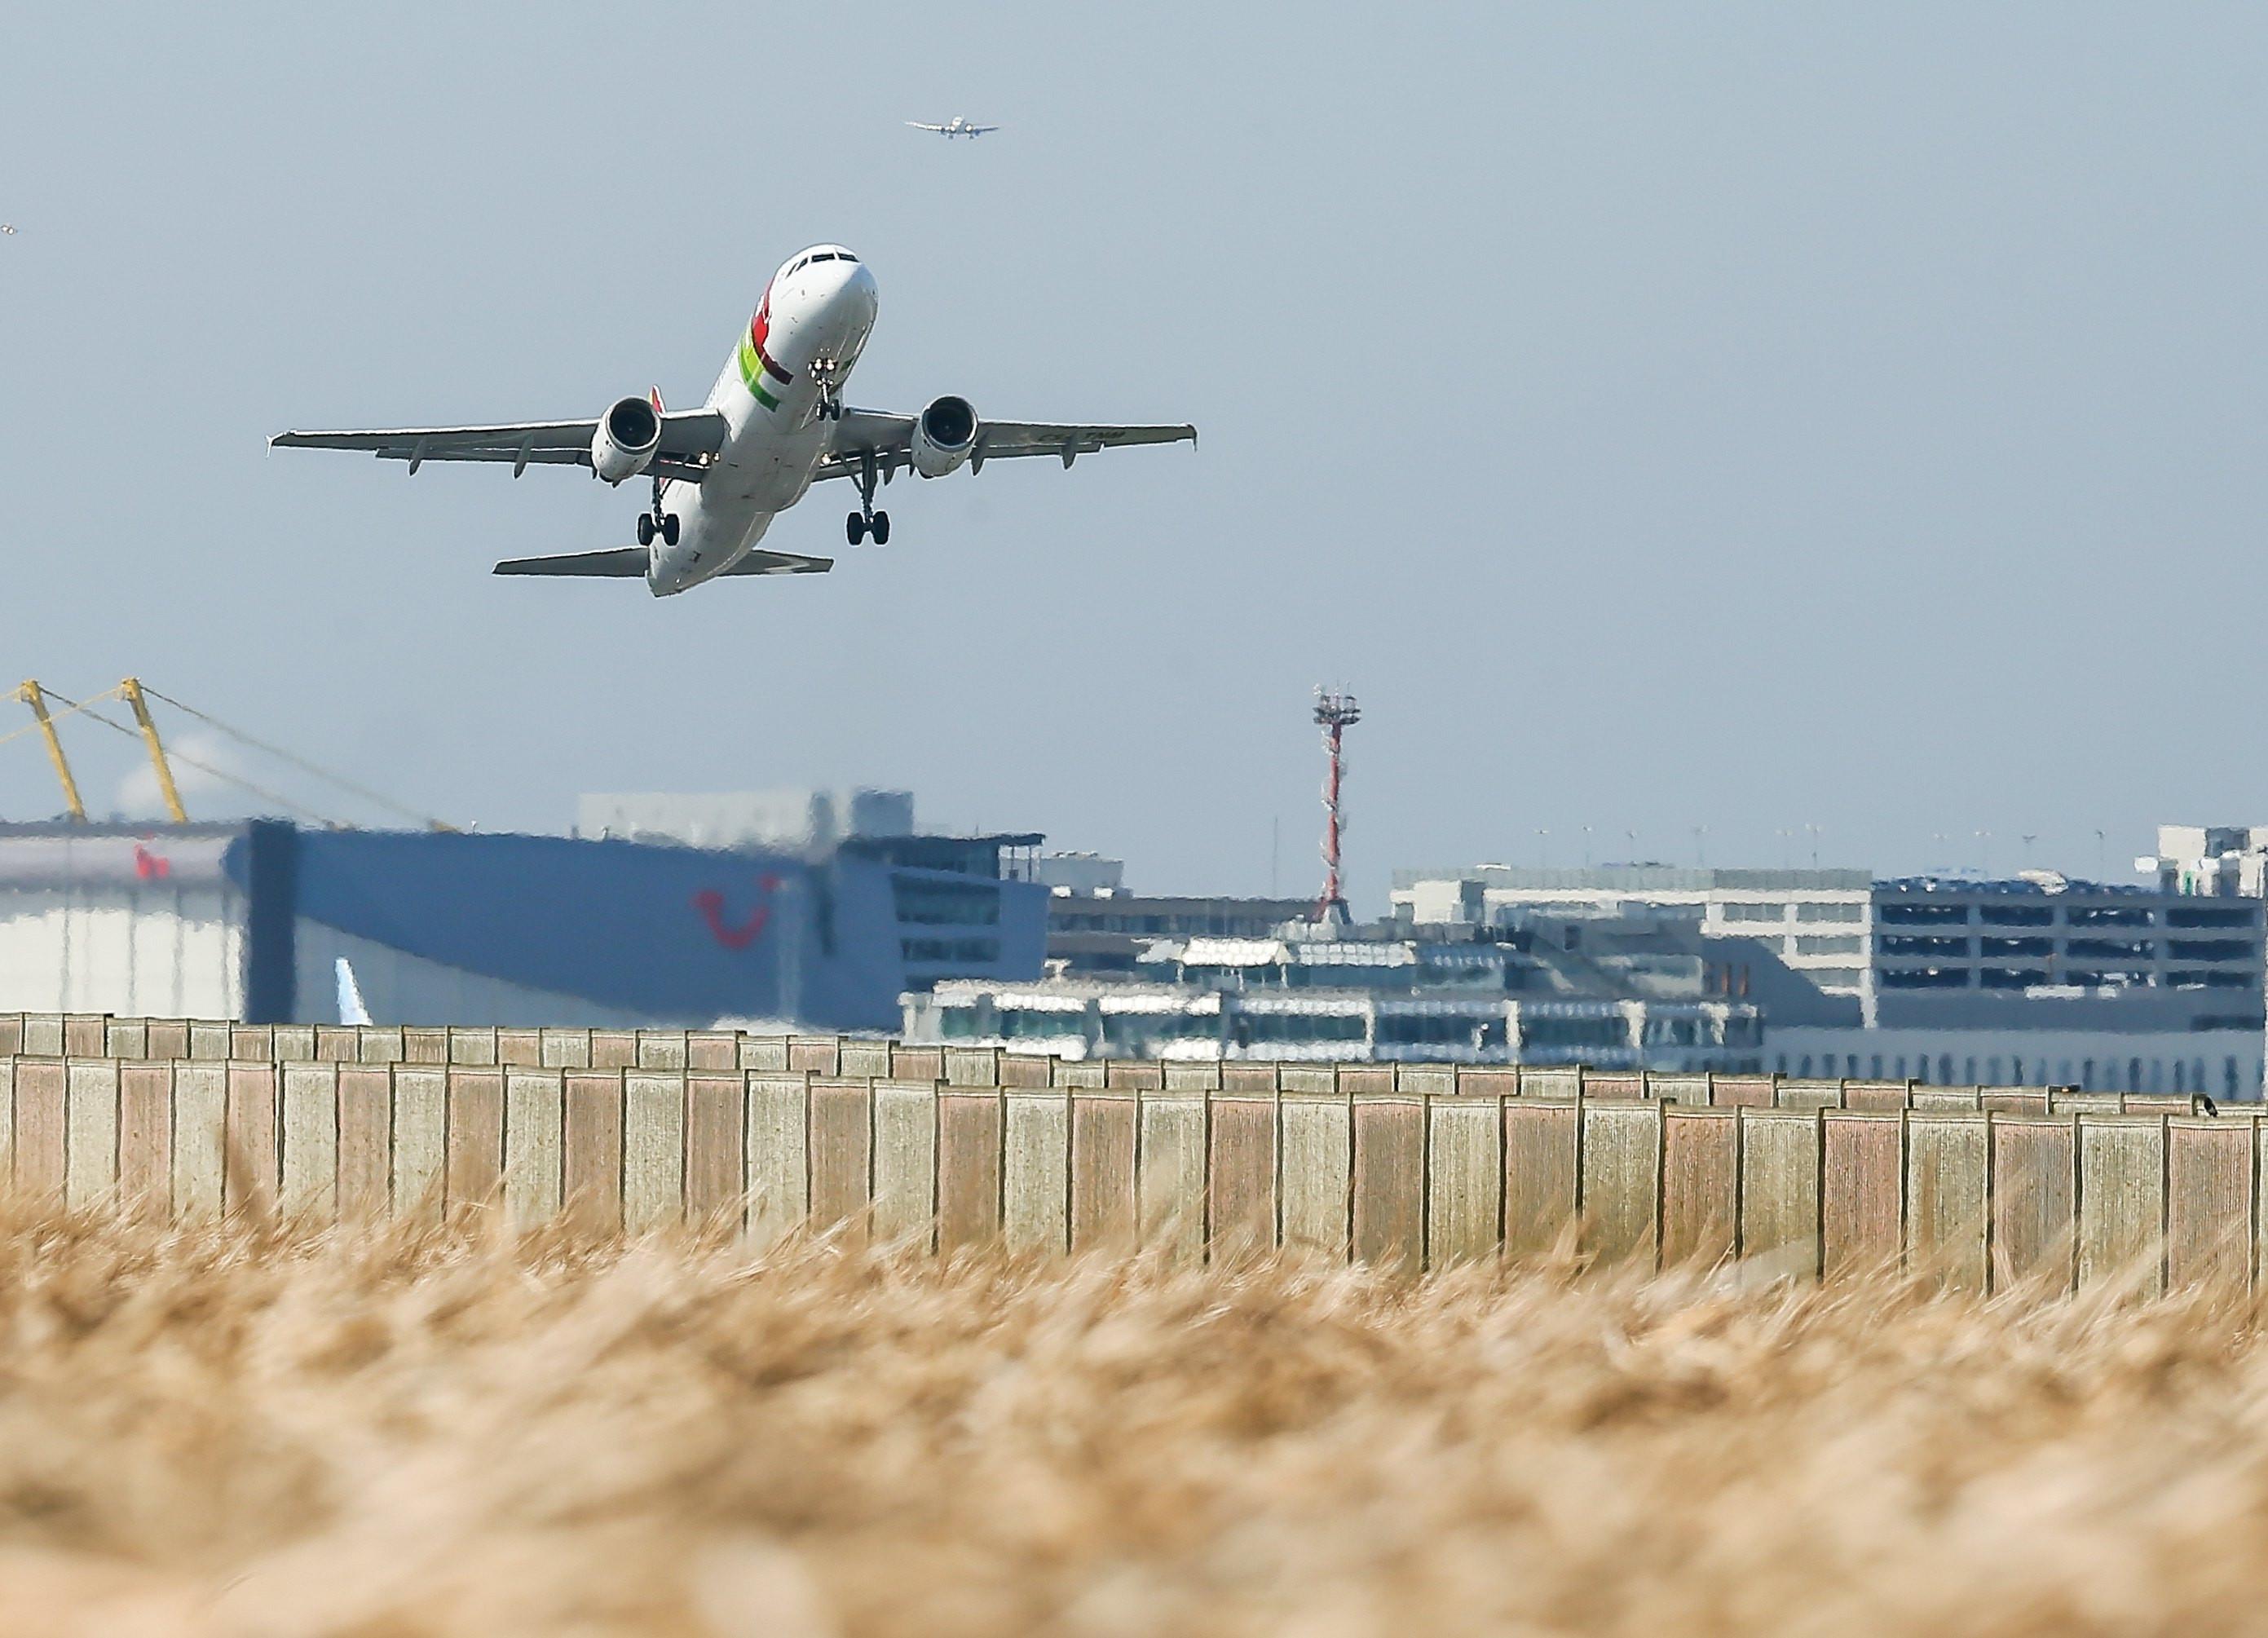 TAP suspende voos para Vigo, Corunha e Oviedo por falta de tripulantes